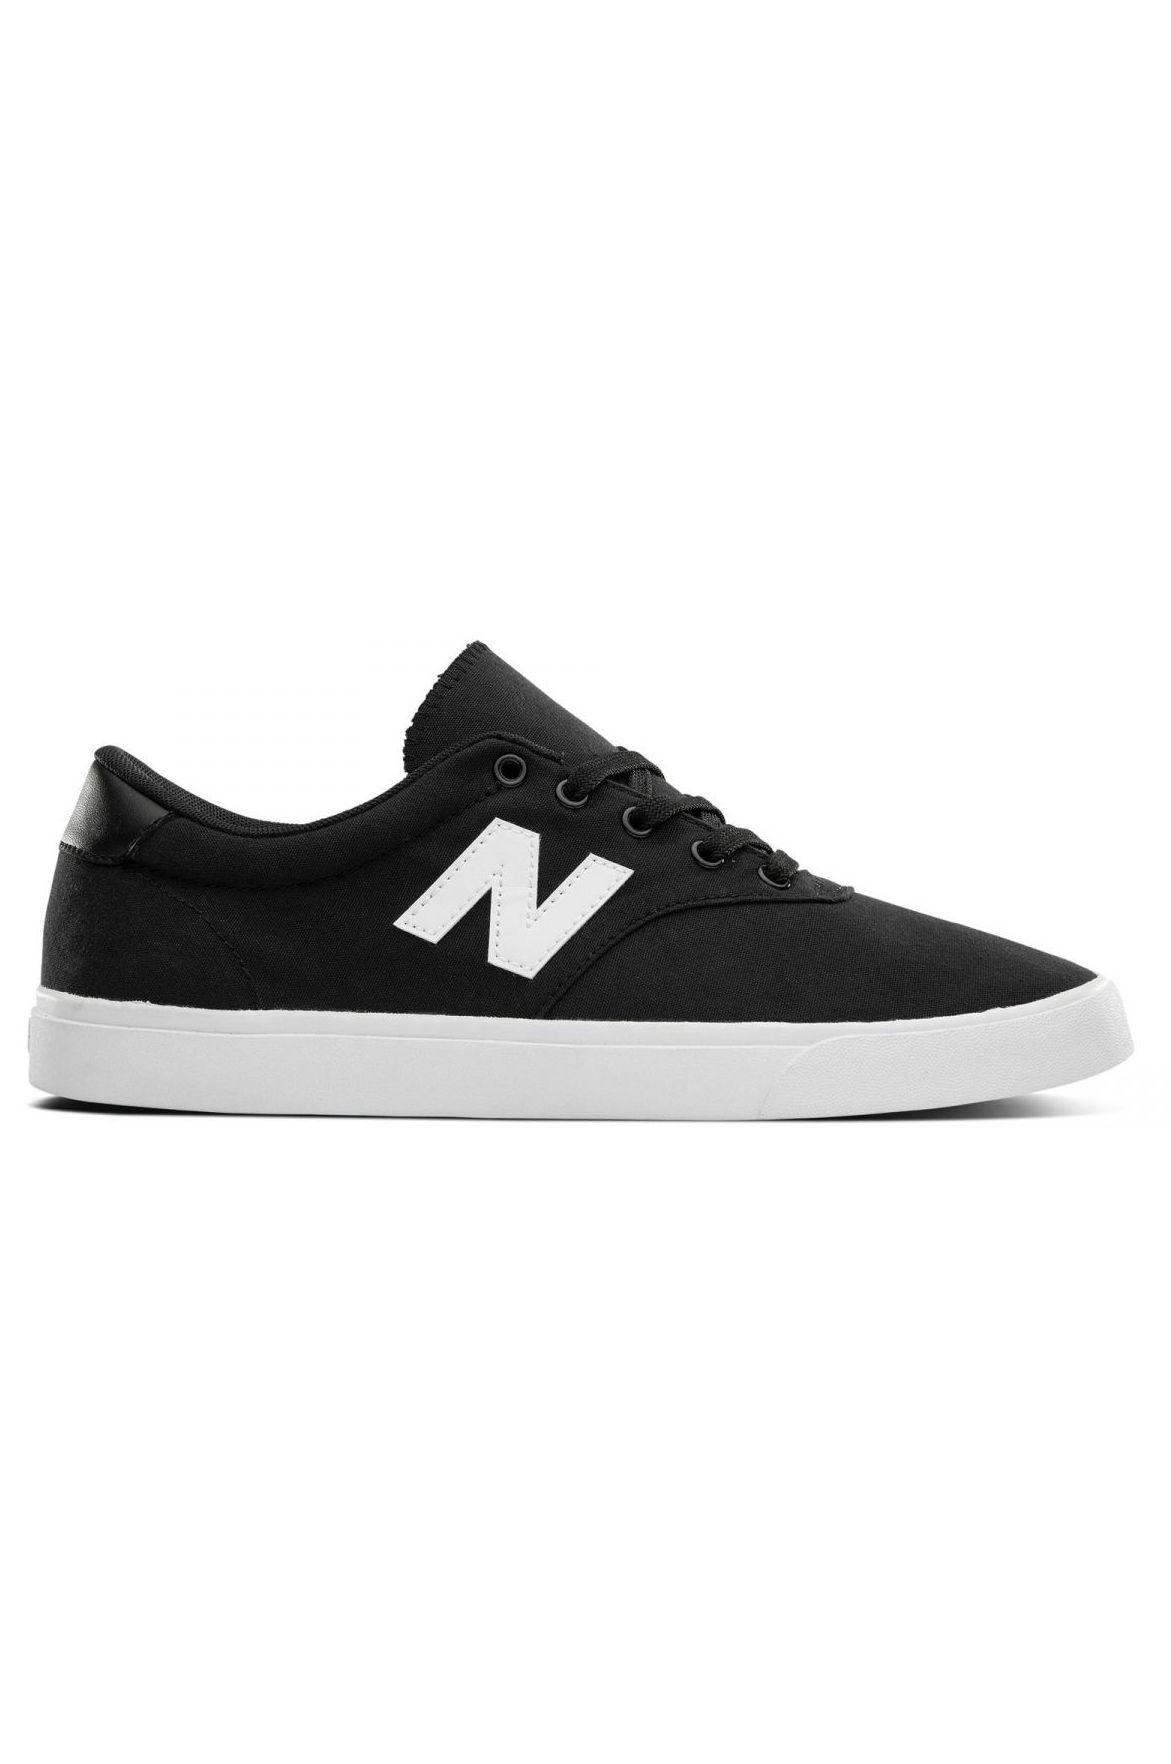 New Balance Shoes AM55 Black